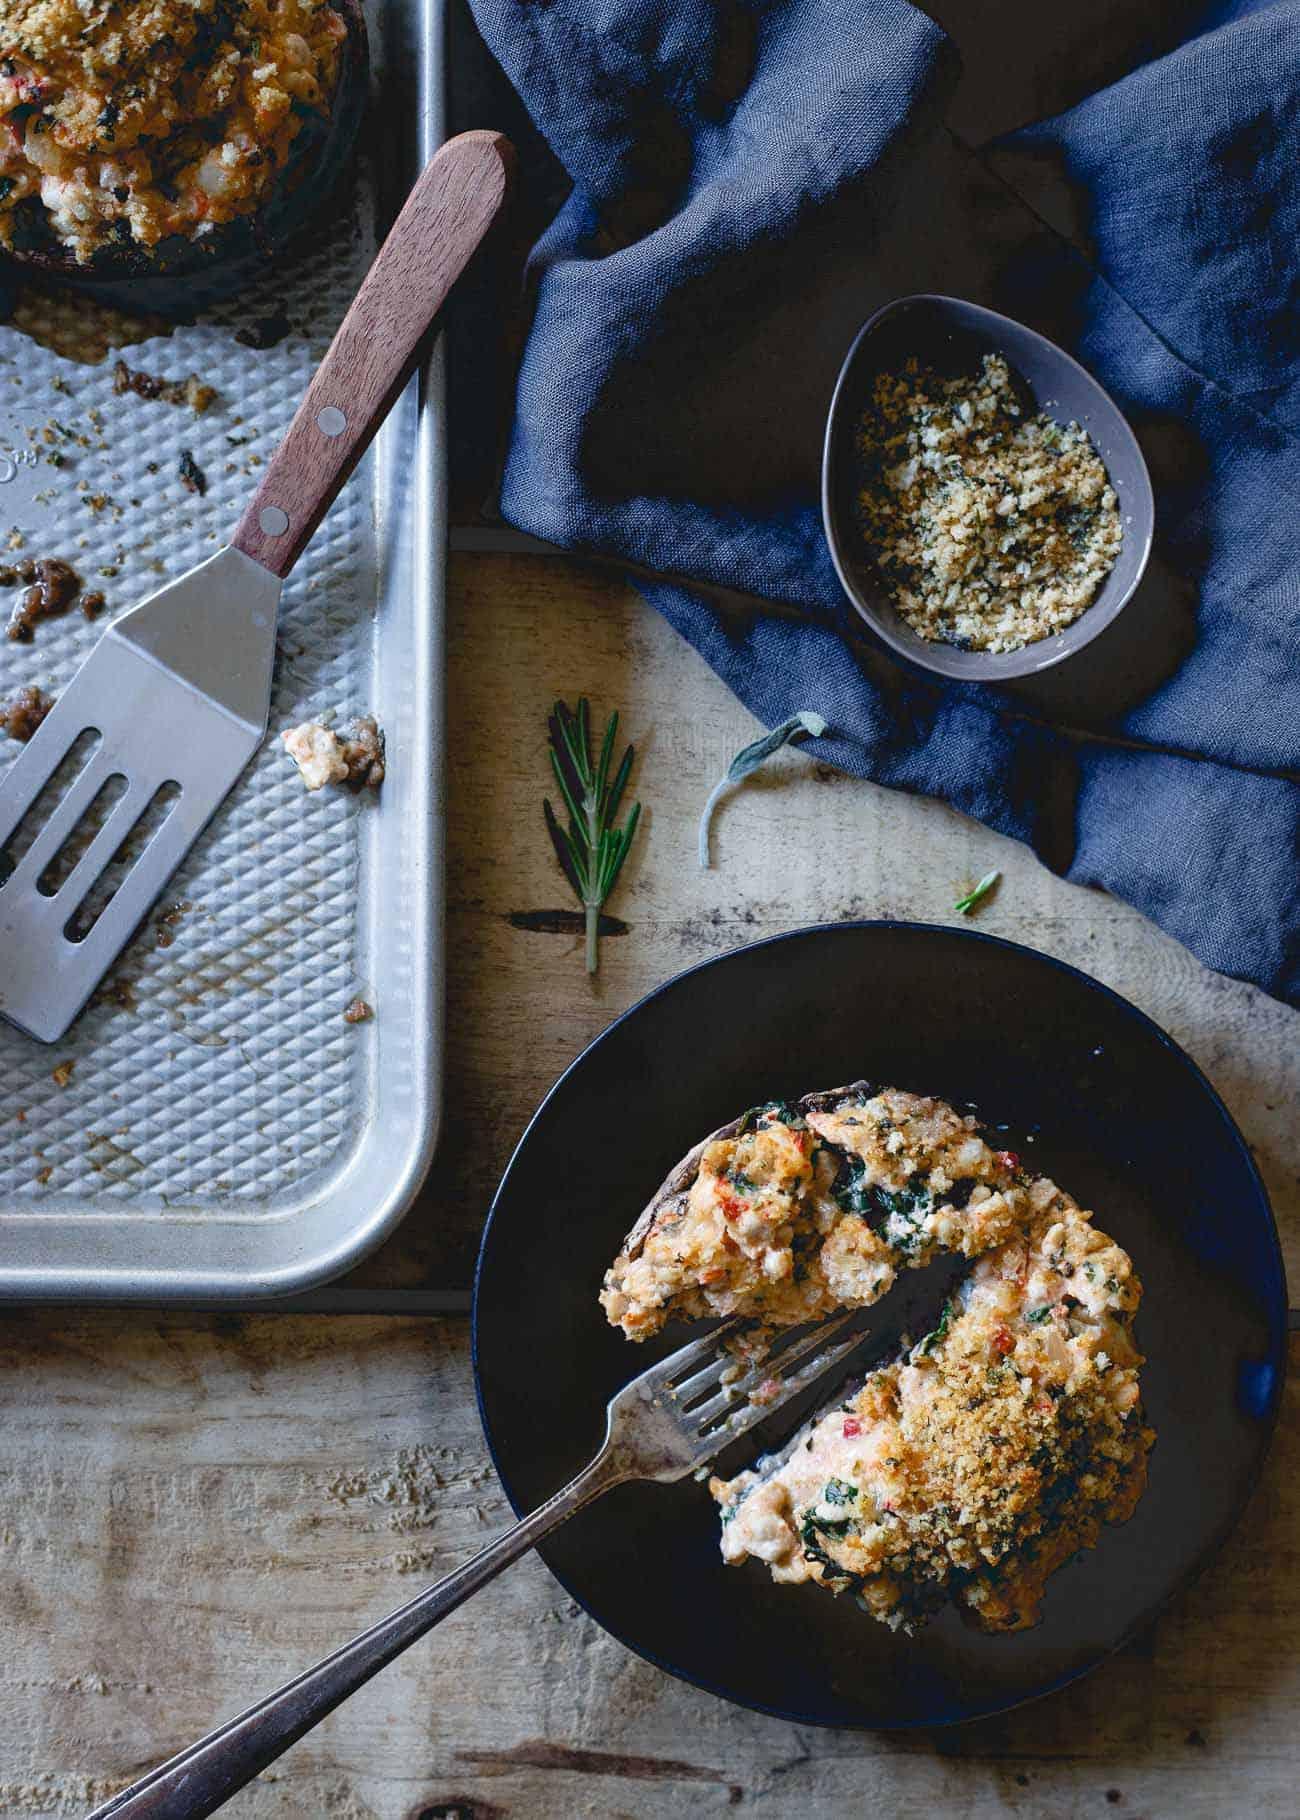 Creamy black garlic cheese makes these turkey stuffed portobello mushrooms decadent and delicious!